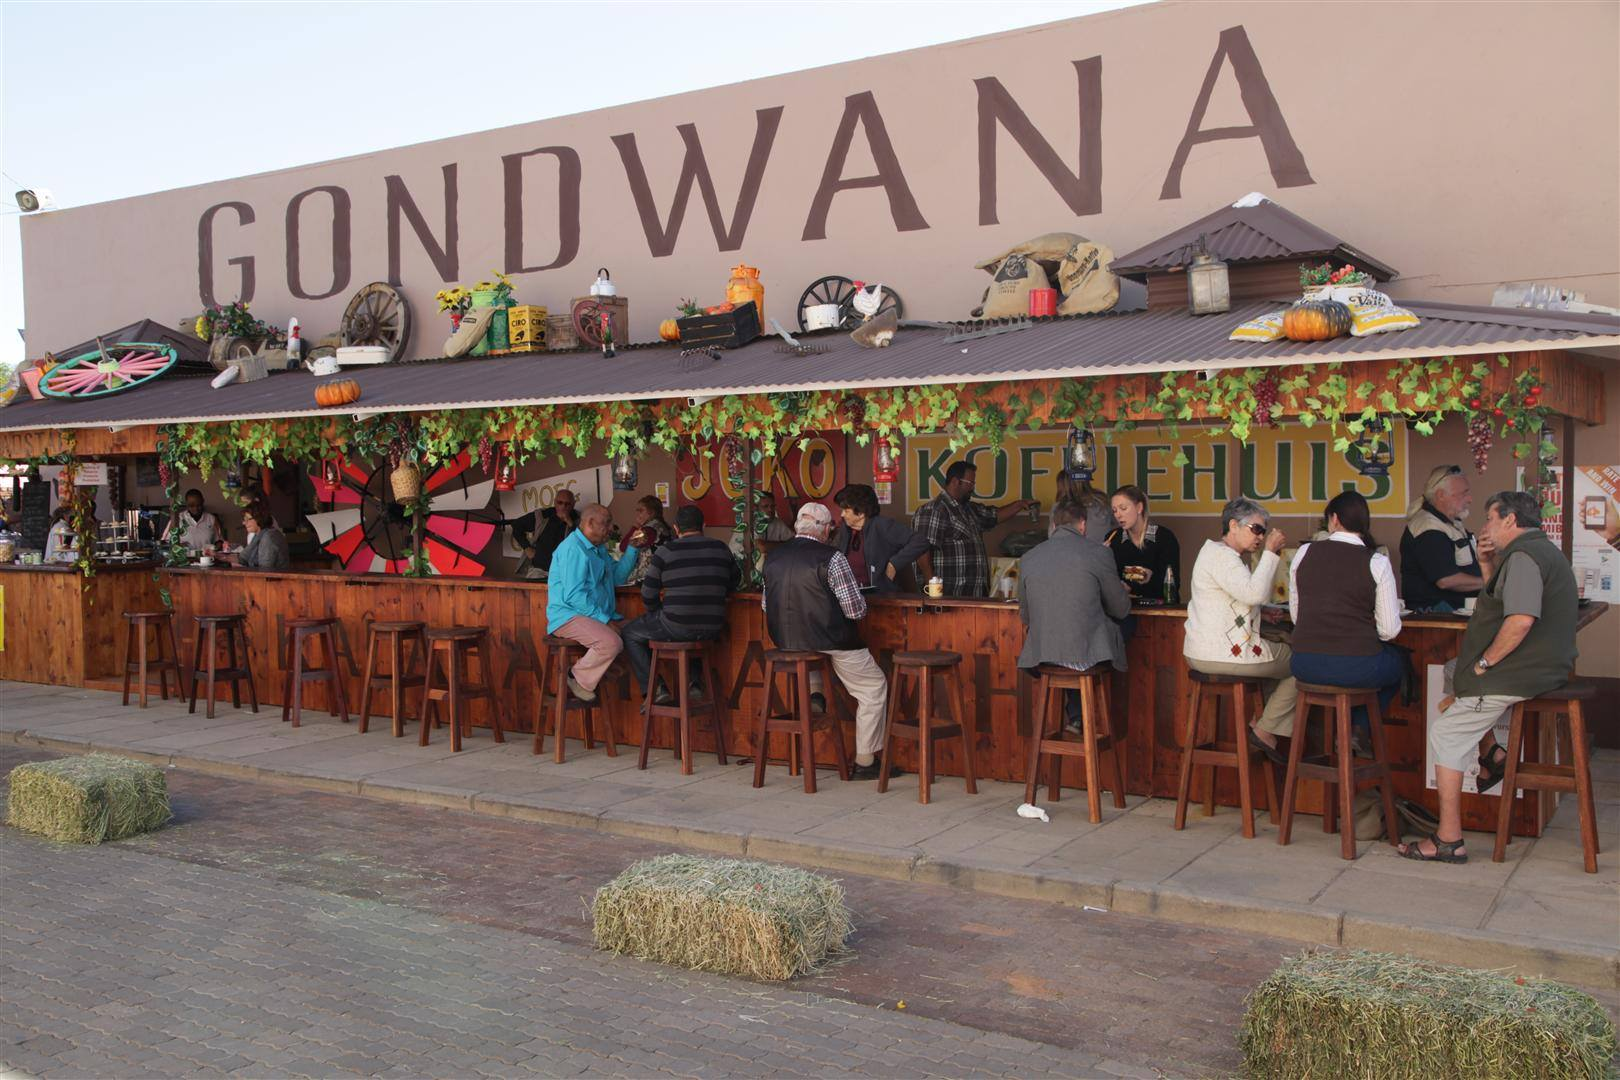 Tourism set to be major contributor to Namibian economy